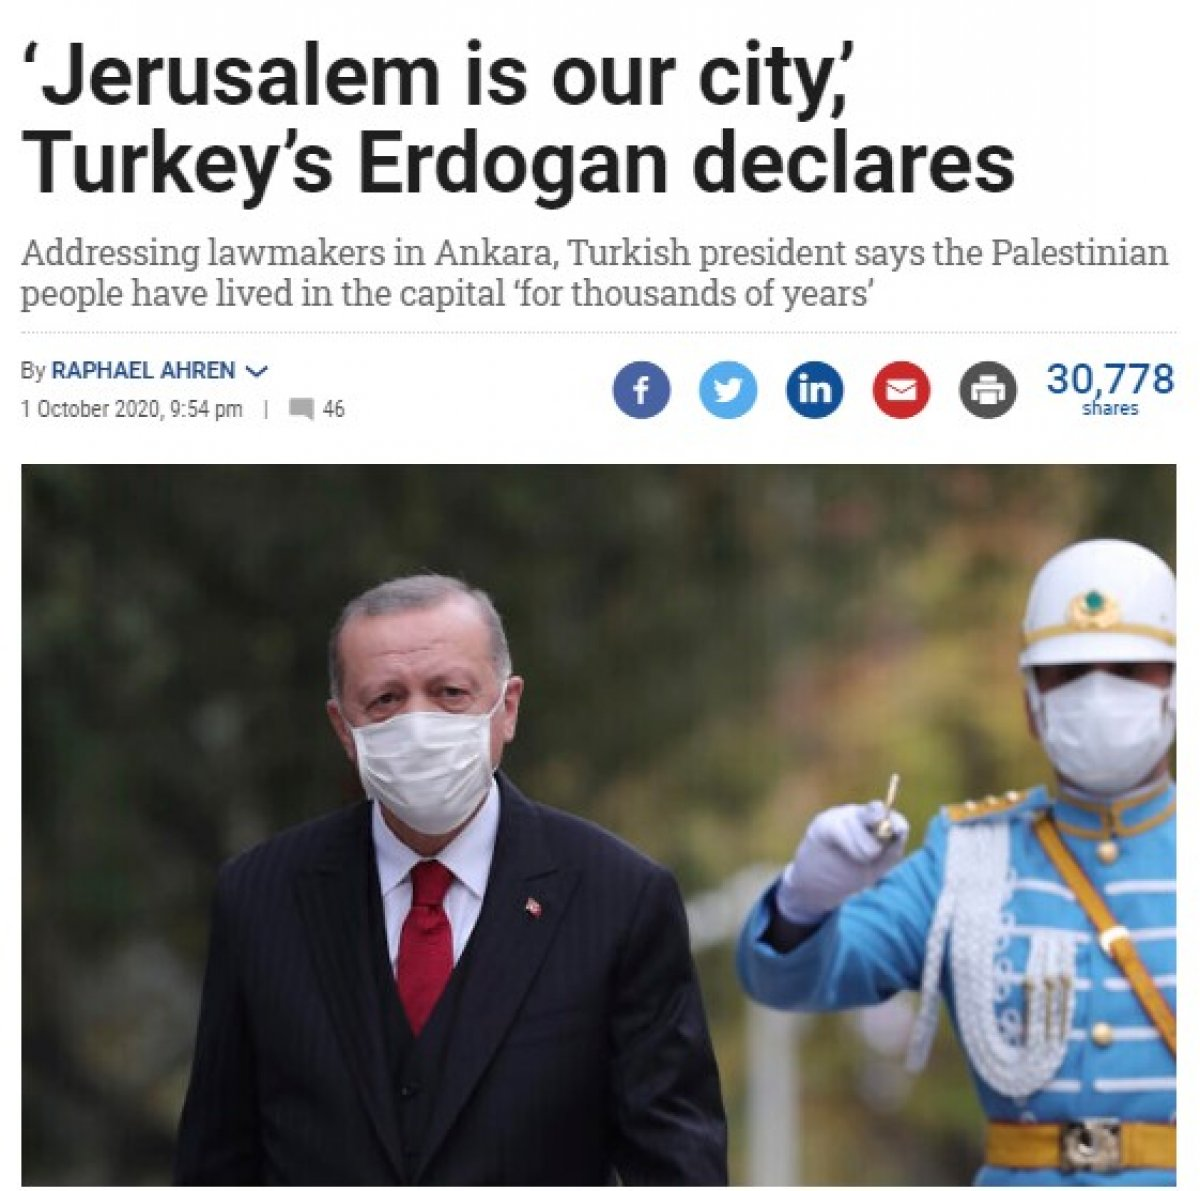 erdogan_4523.jpg